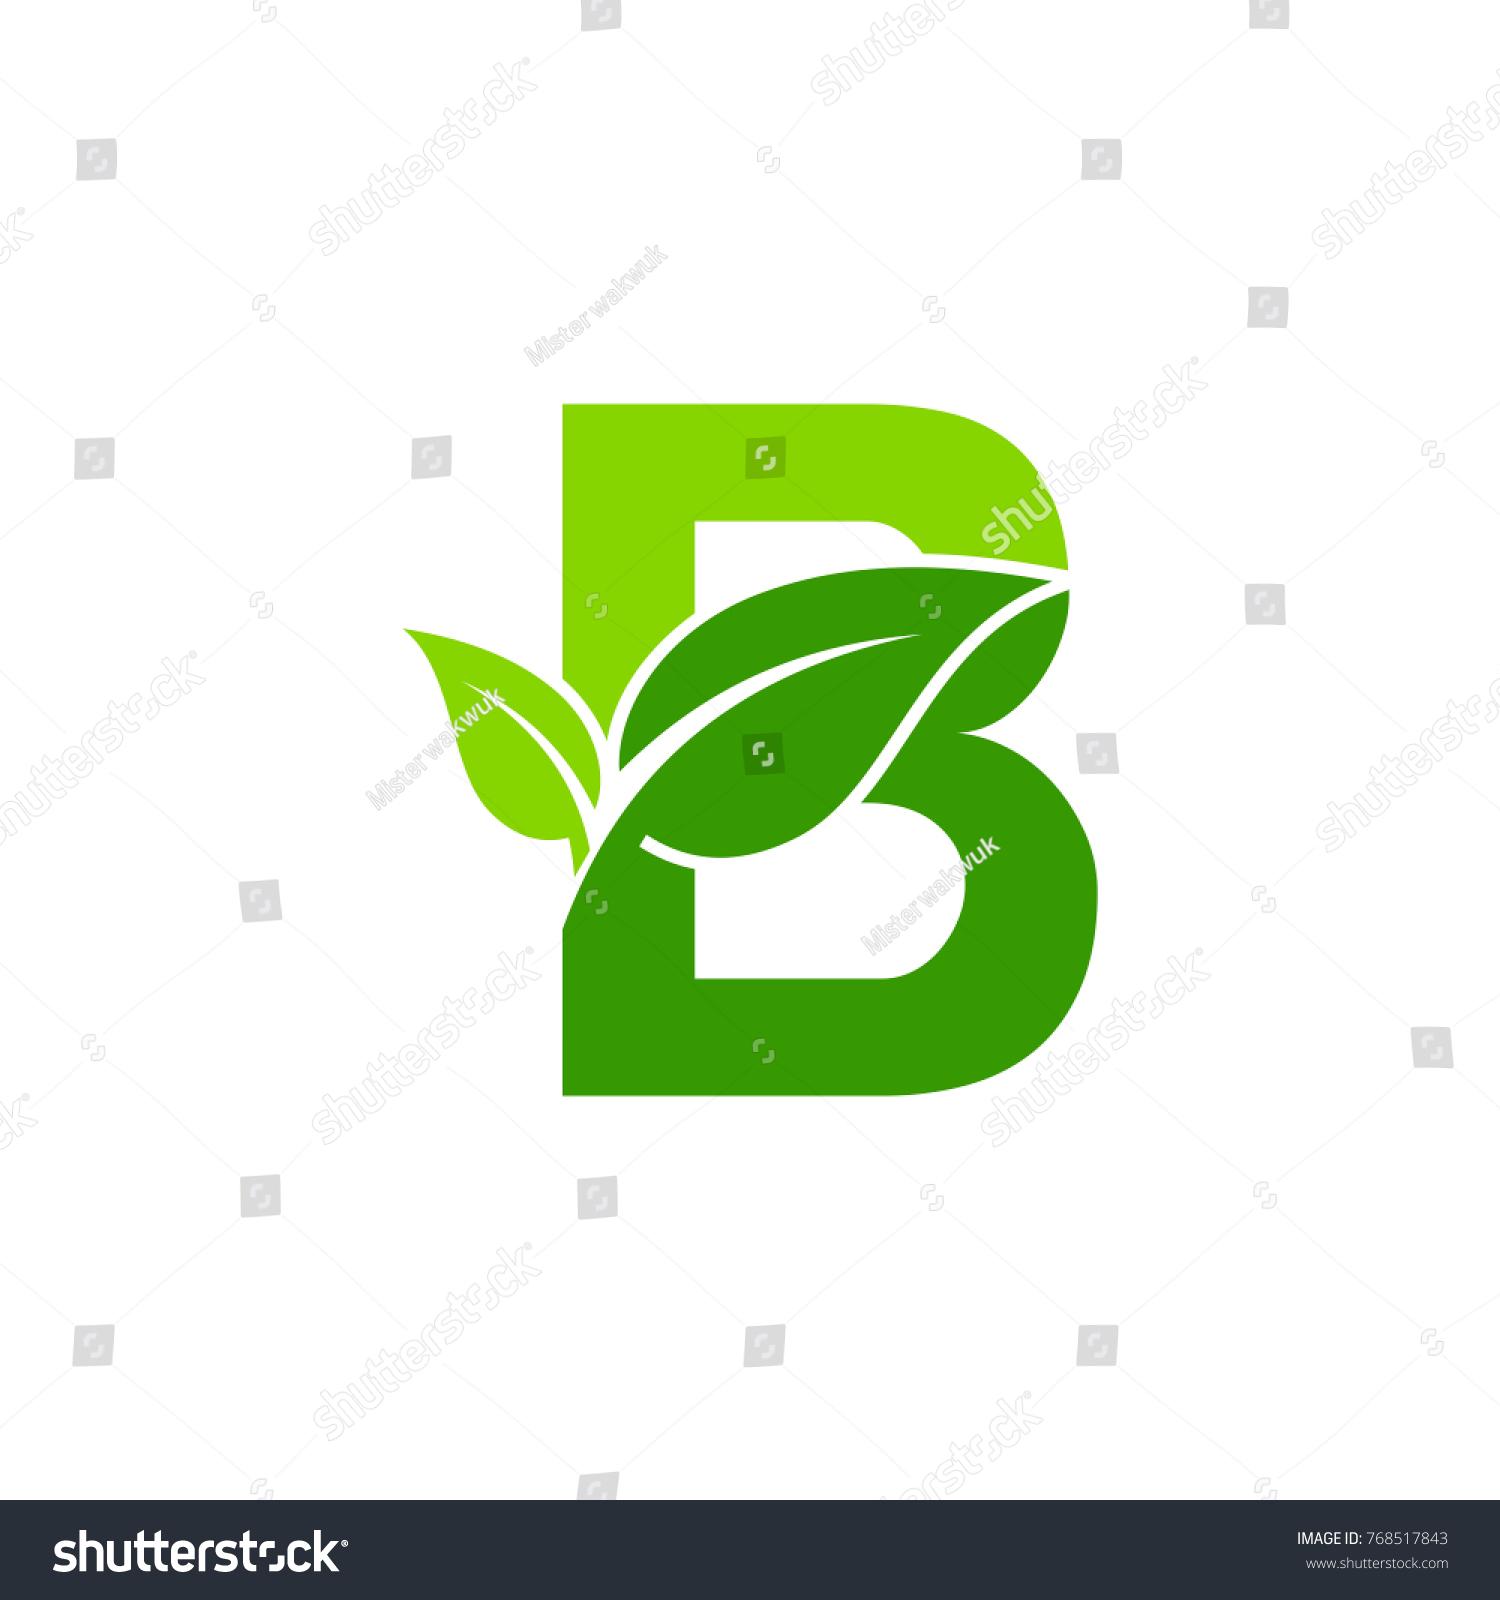 Initials b icon design nature green stock vector 768517843 initials b icon design nature green leaf symbol biocorpaavc Gallery